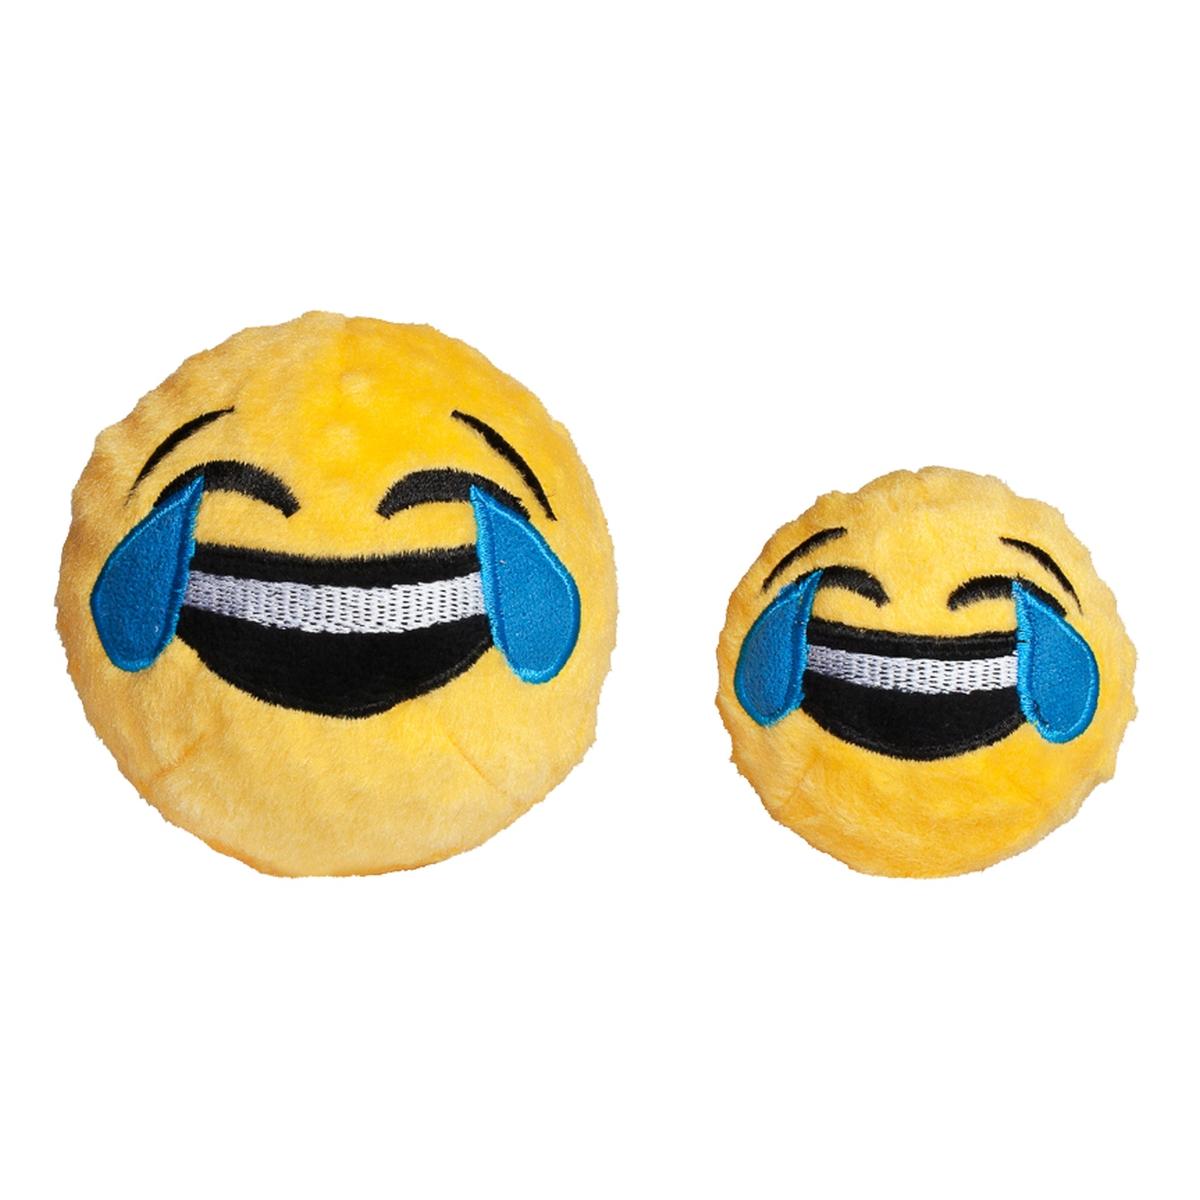 FD CRYING/LAUGH.EMOJI FABALL M 00001